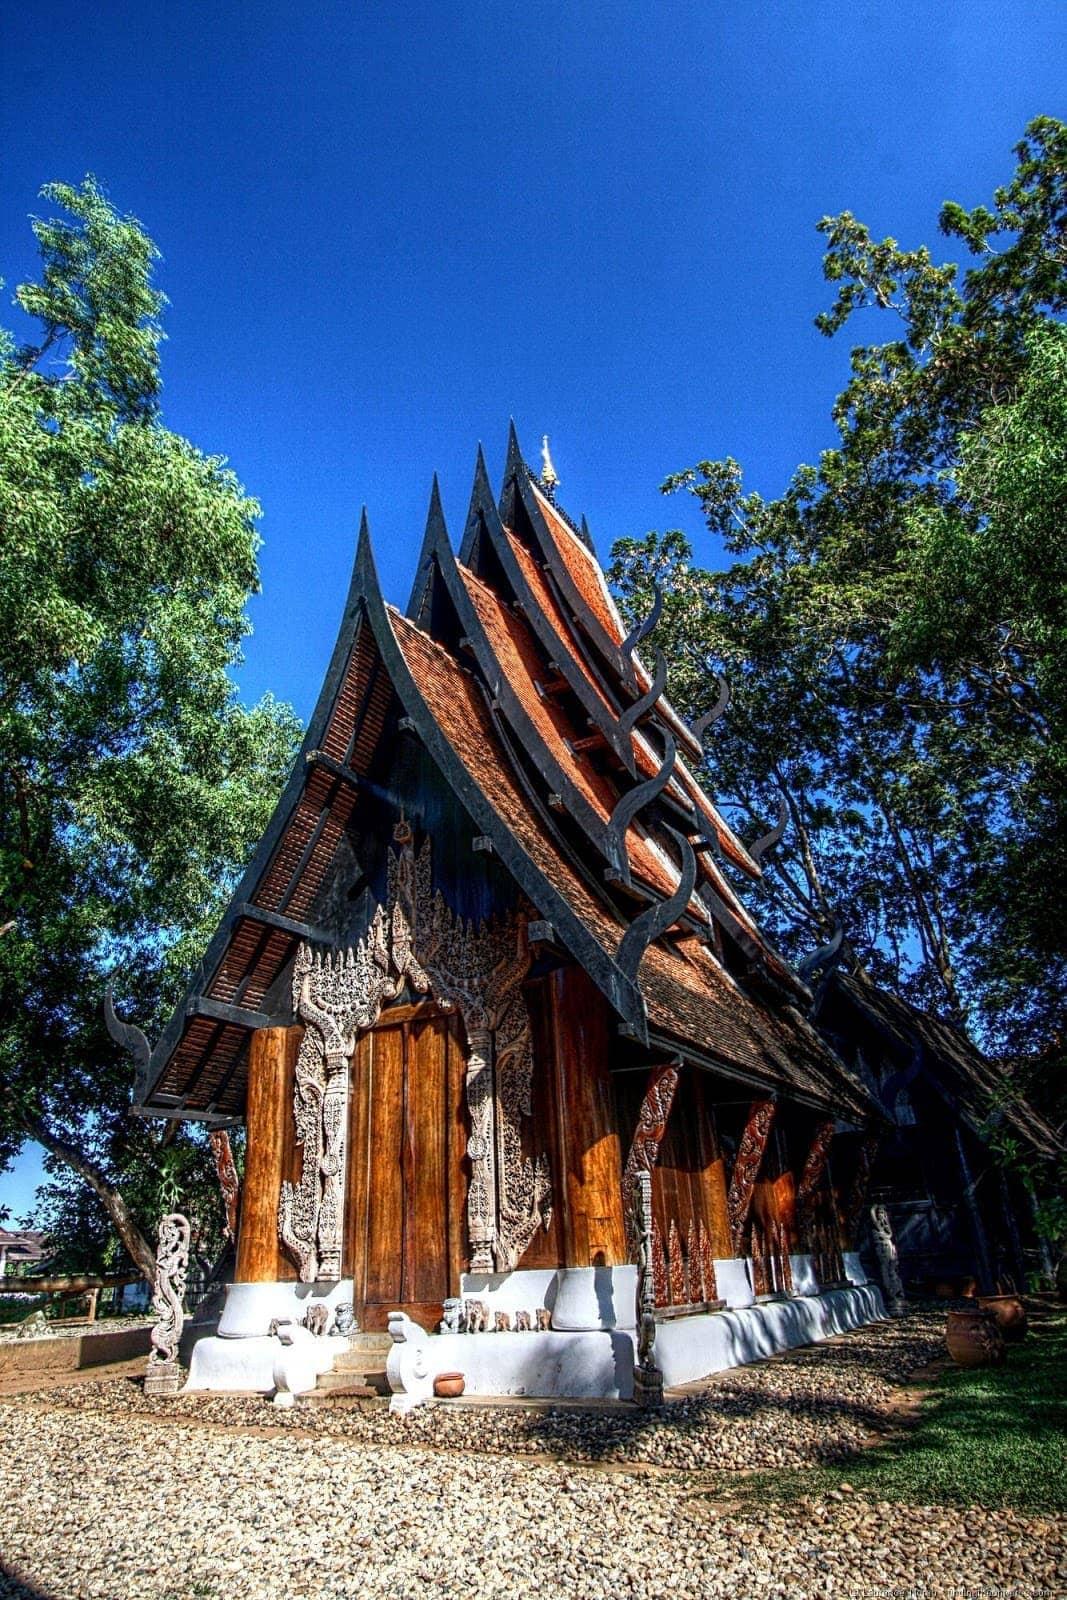 Black temple small house Chiang Rai Thailand